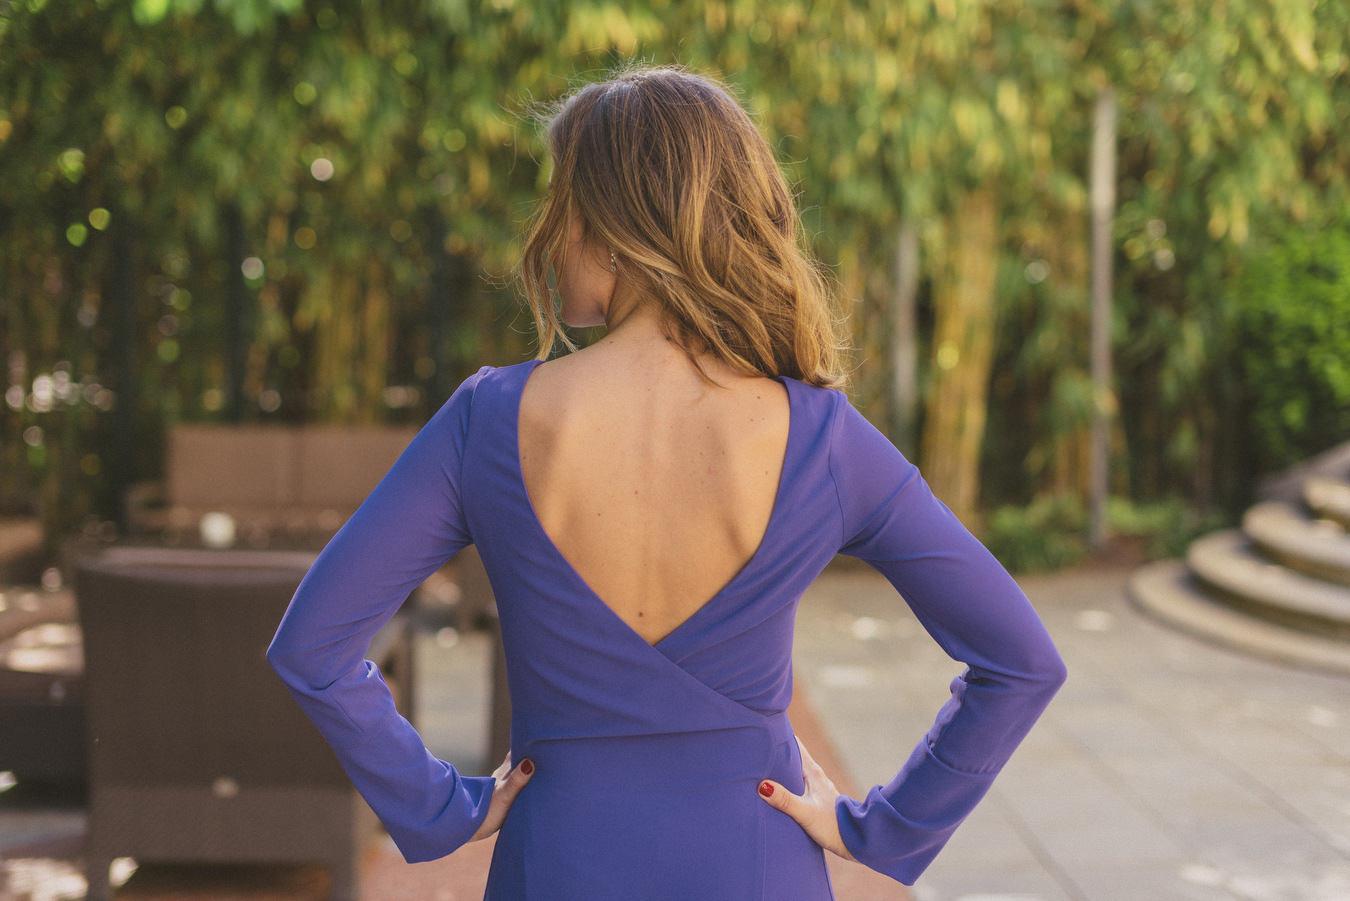 calista-one-lista-de-bodas-online-blog-de-bodas-bossanova-looks-invitadas-biombo-3